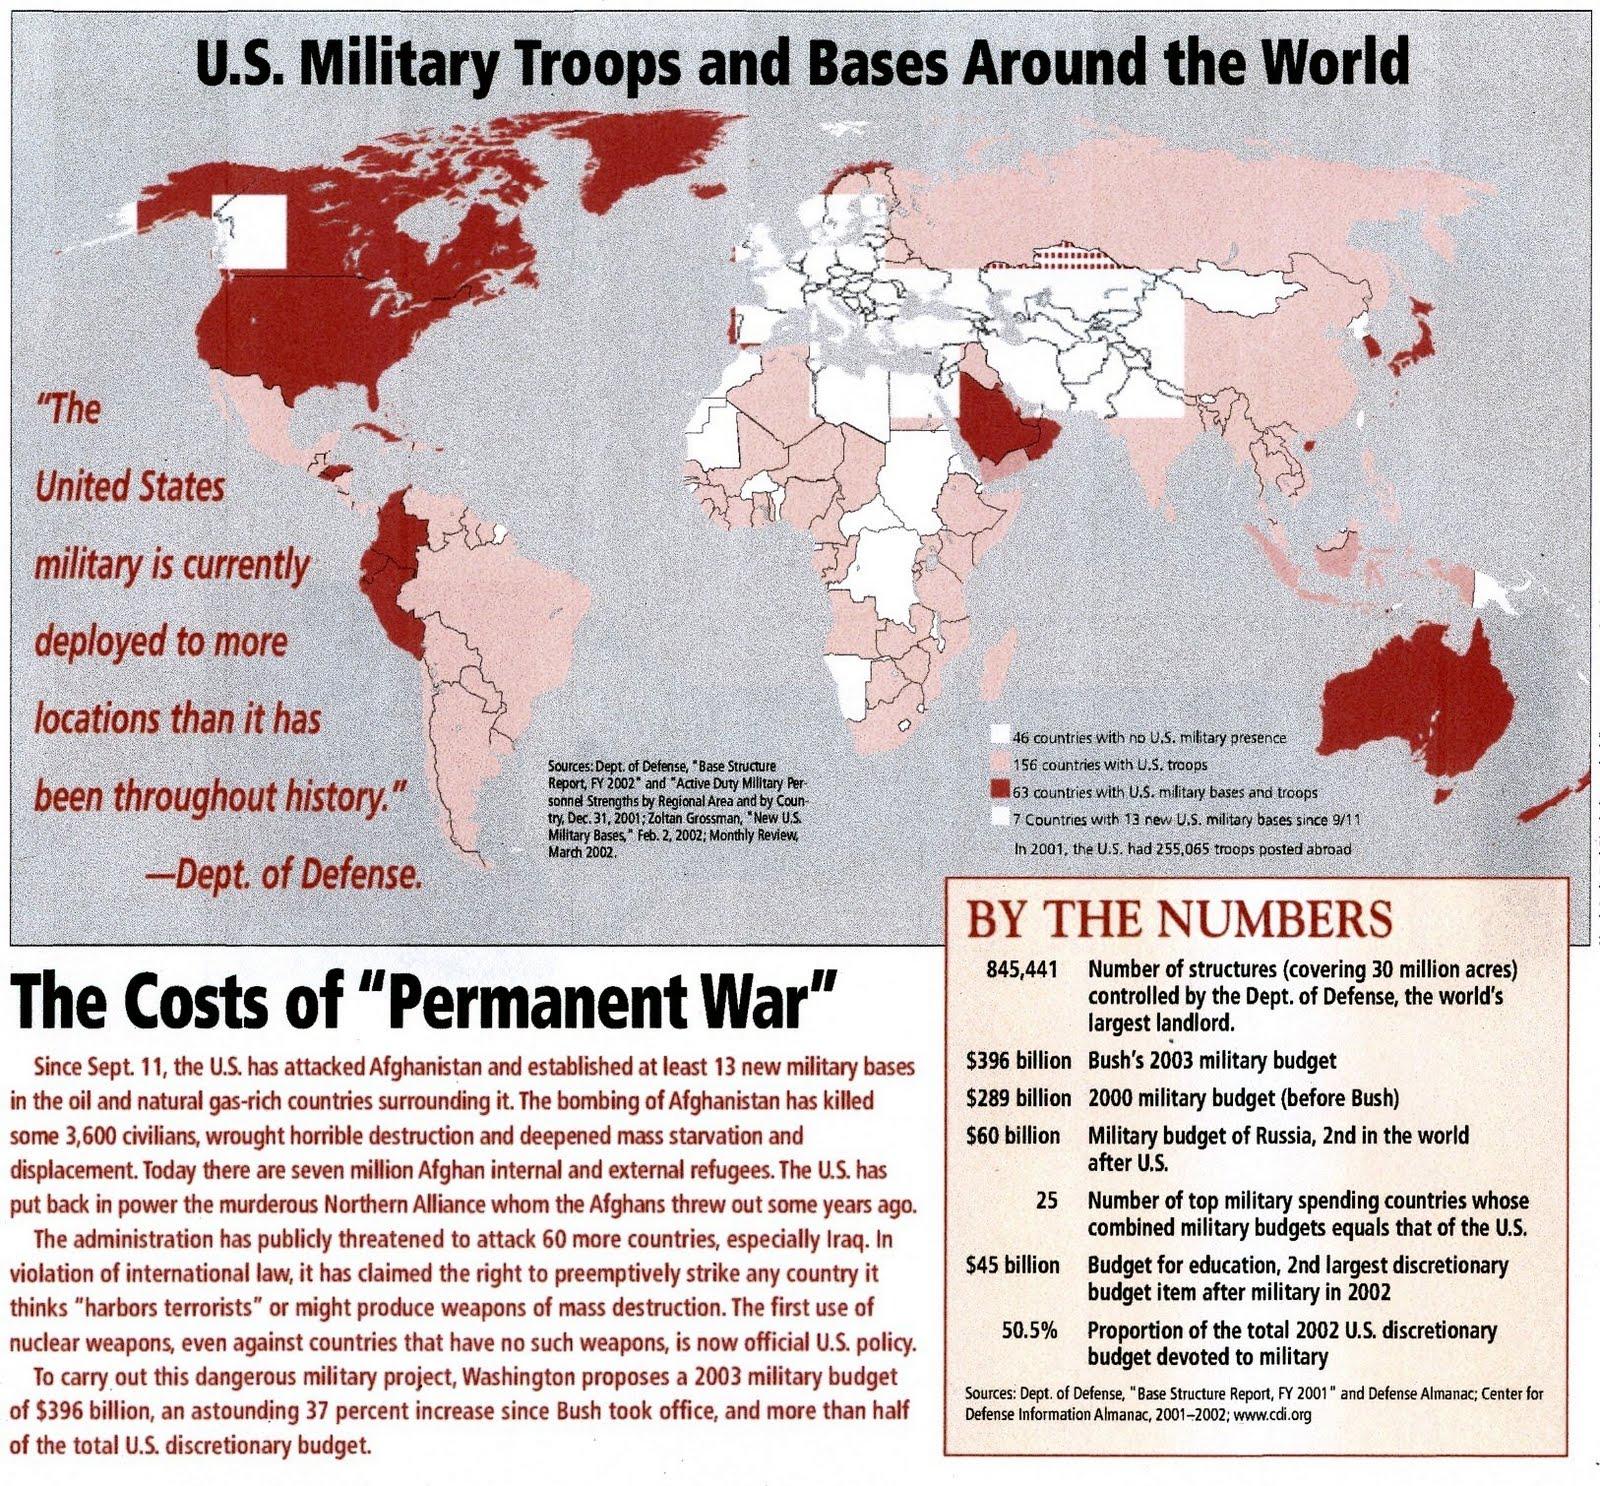 The Size of the U.S. Military Footprint – Quixotic Pedagogue